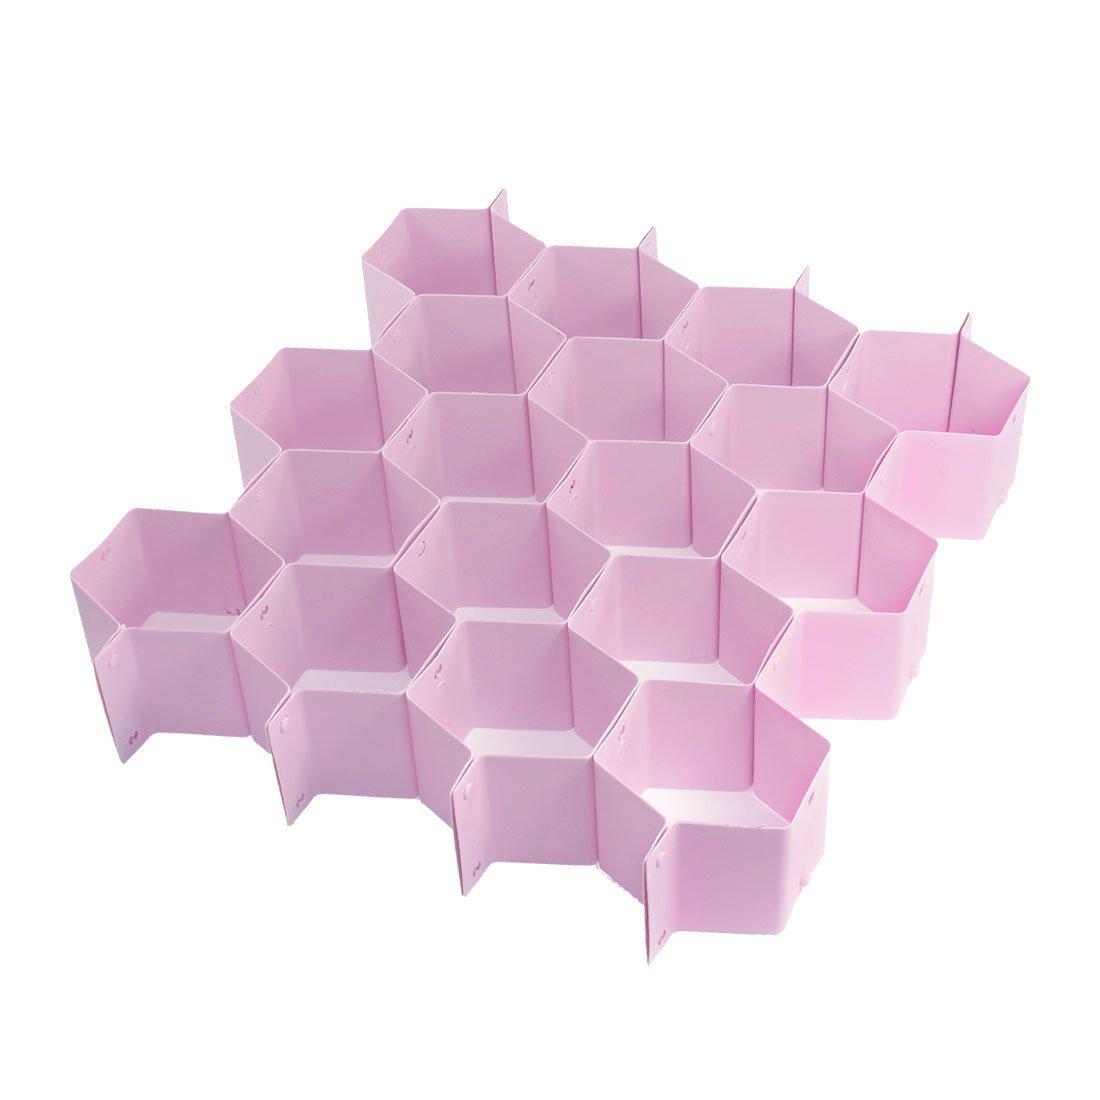 Kunststoff Honeycomb Stil Tidy Drawer Divider-Speicher-Organisator-Rosa DealMux